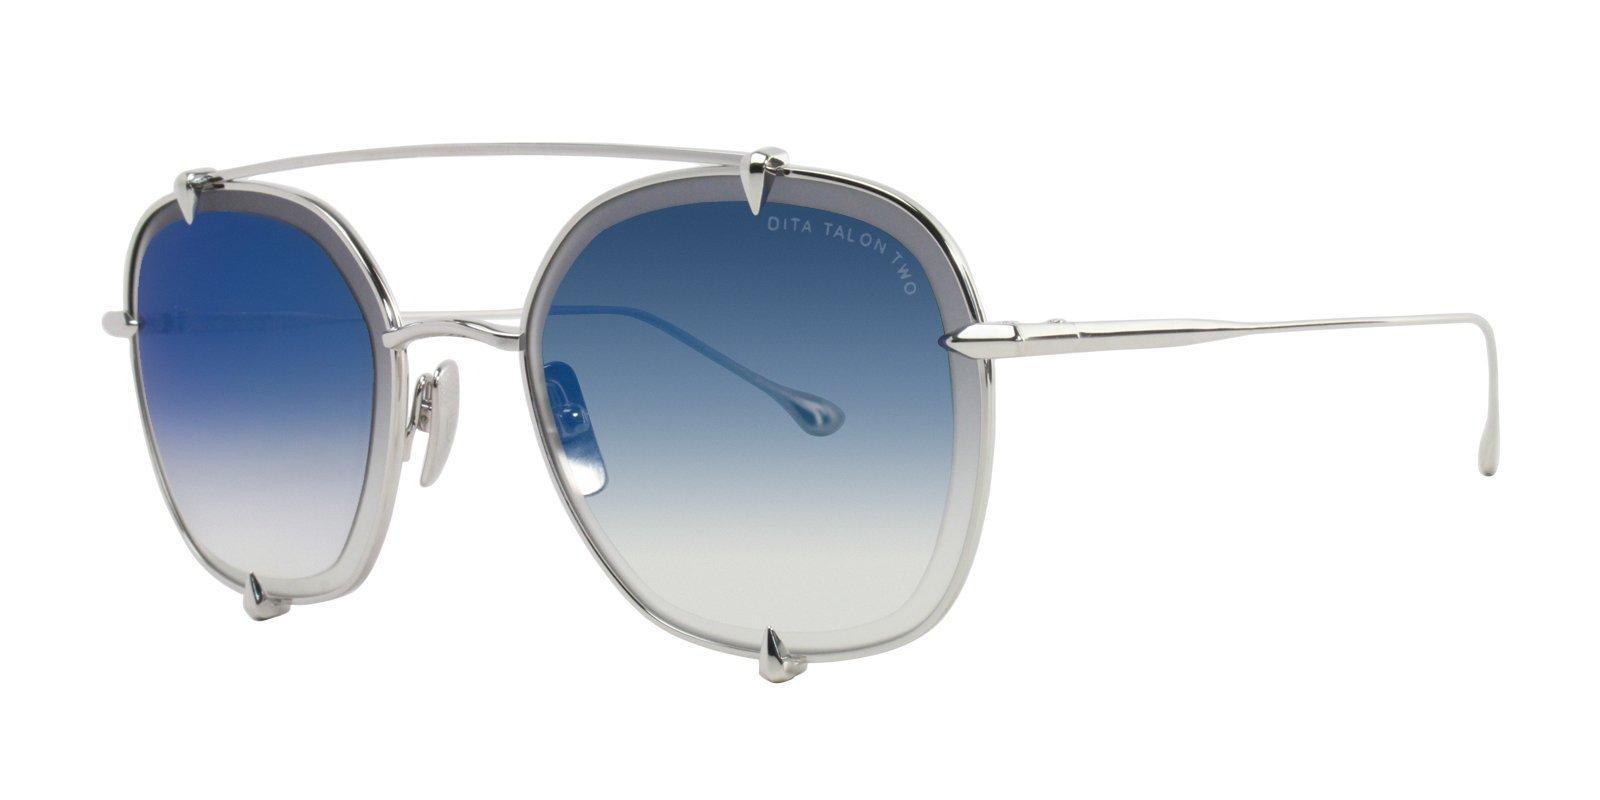 70390c8b3c2 dita-sunglasses-dita-talon-two-silver-blue-designer-eyes ...